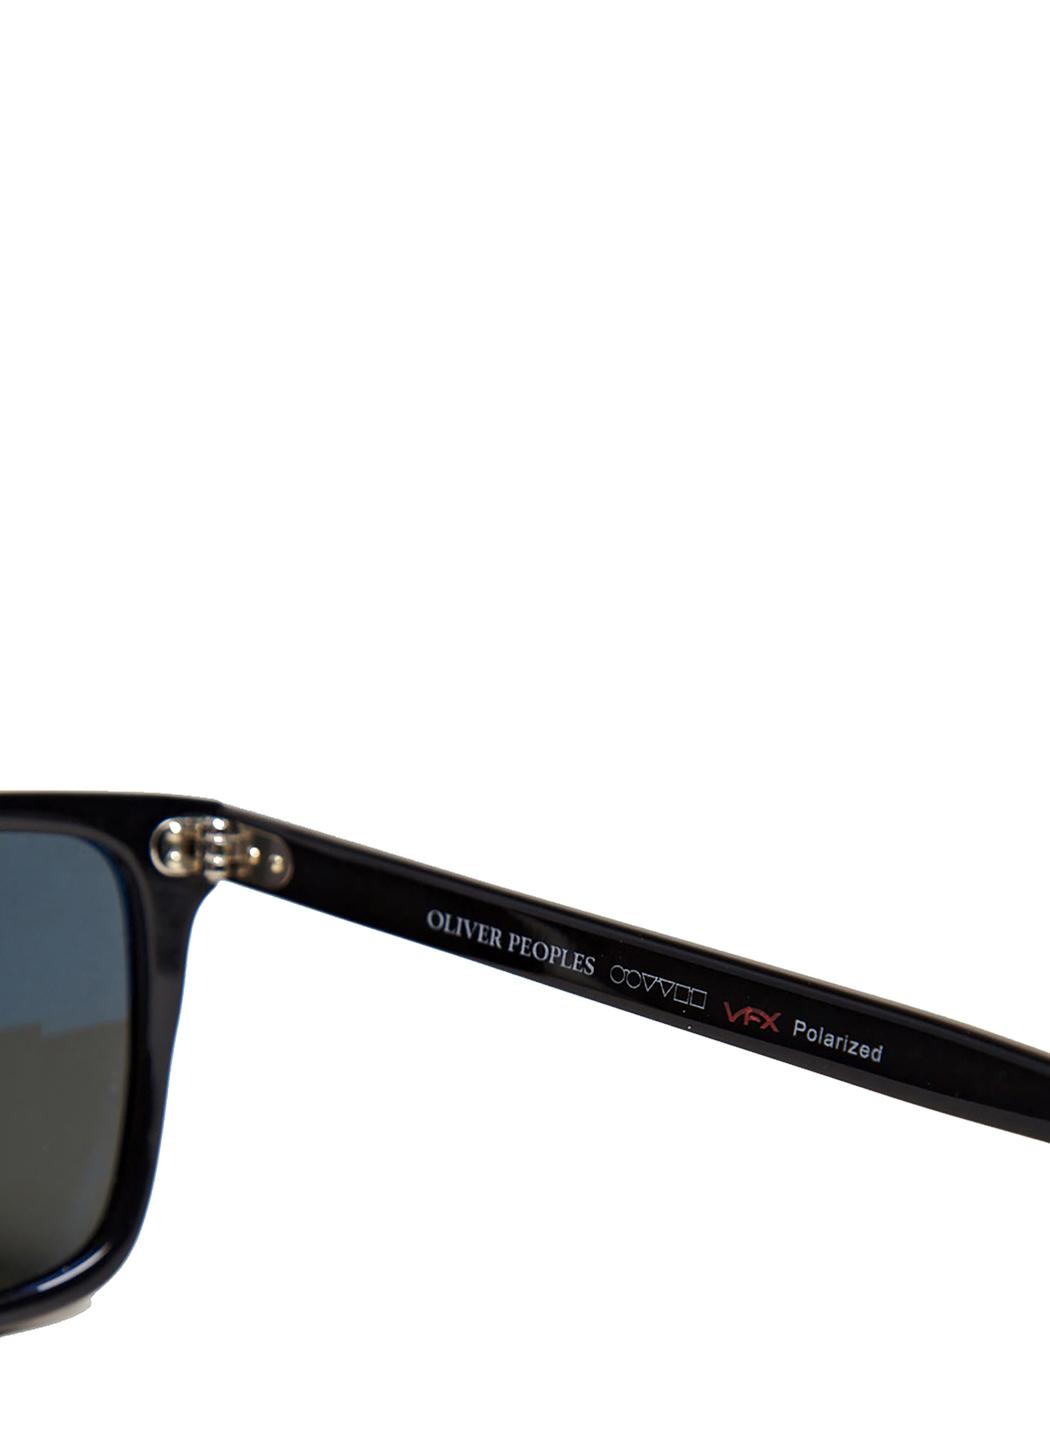 Express Sunglasses  oliver peoples womens bernardo black frame with midnight express